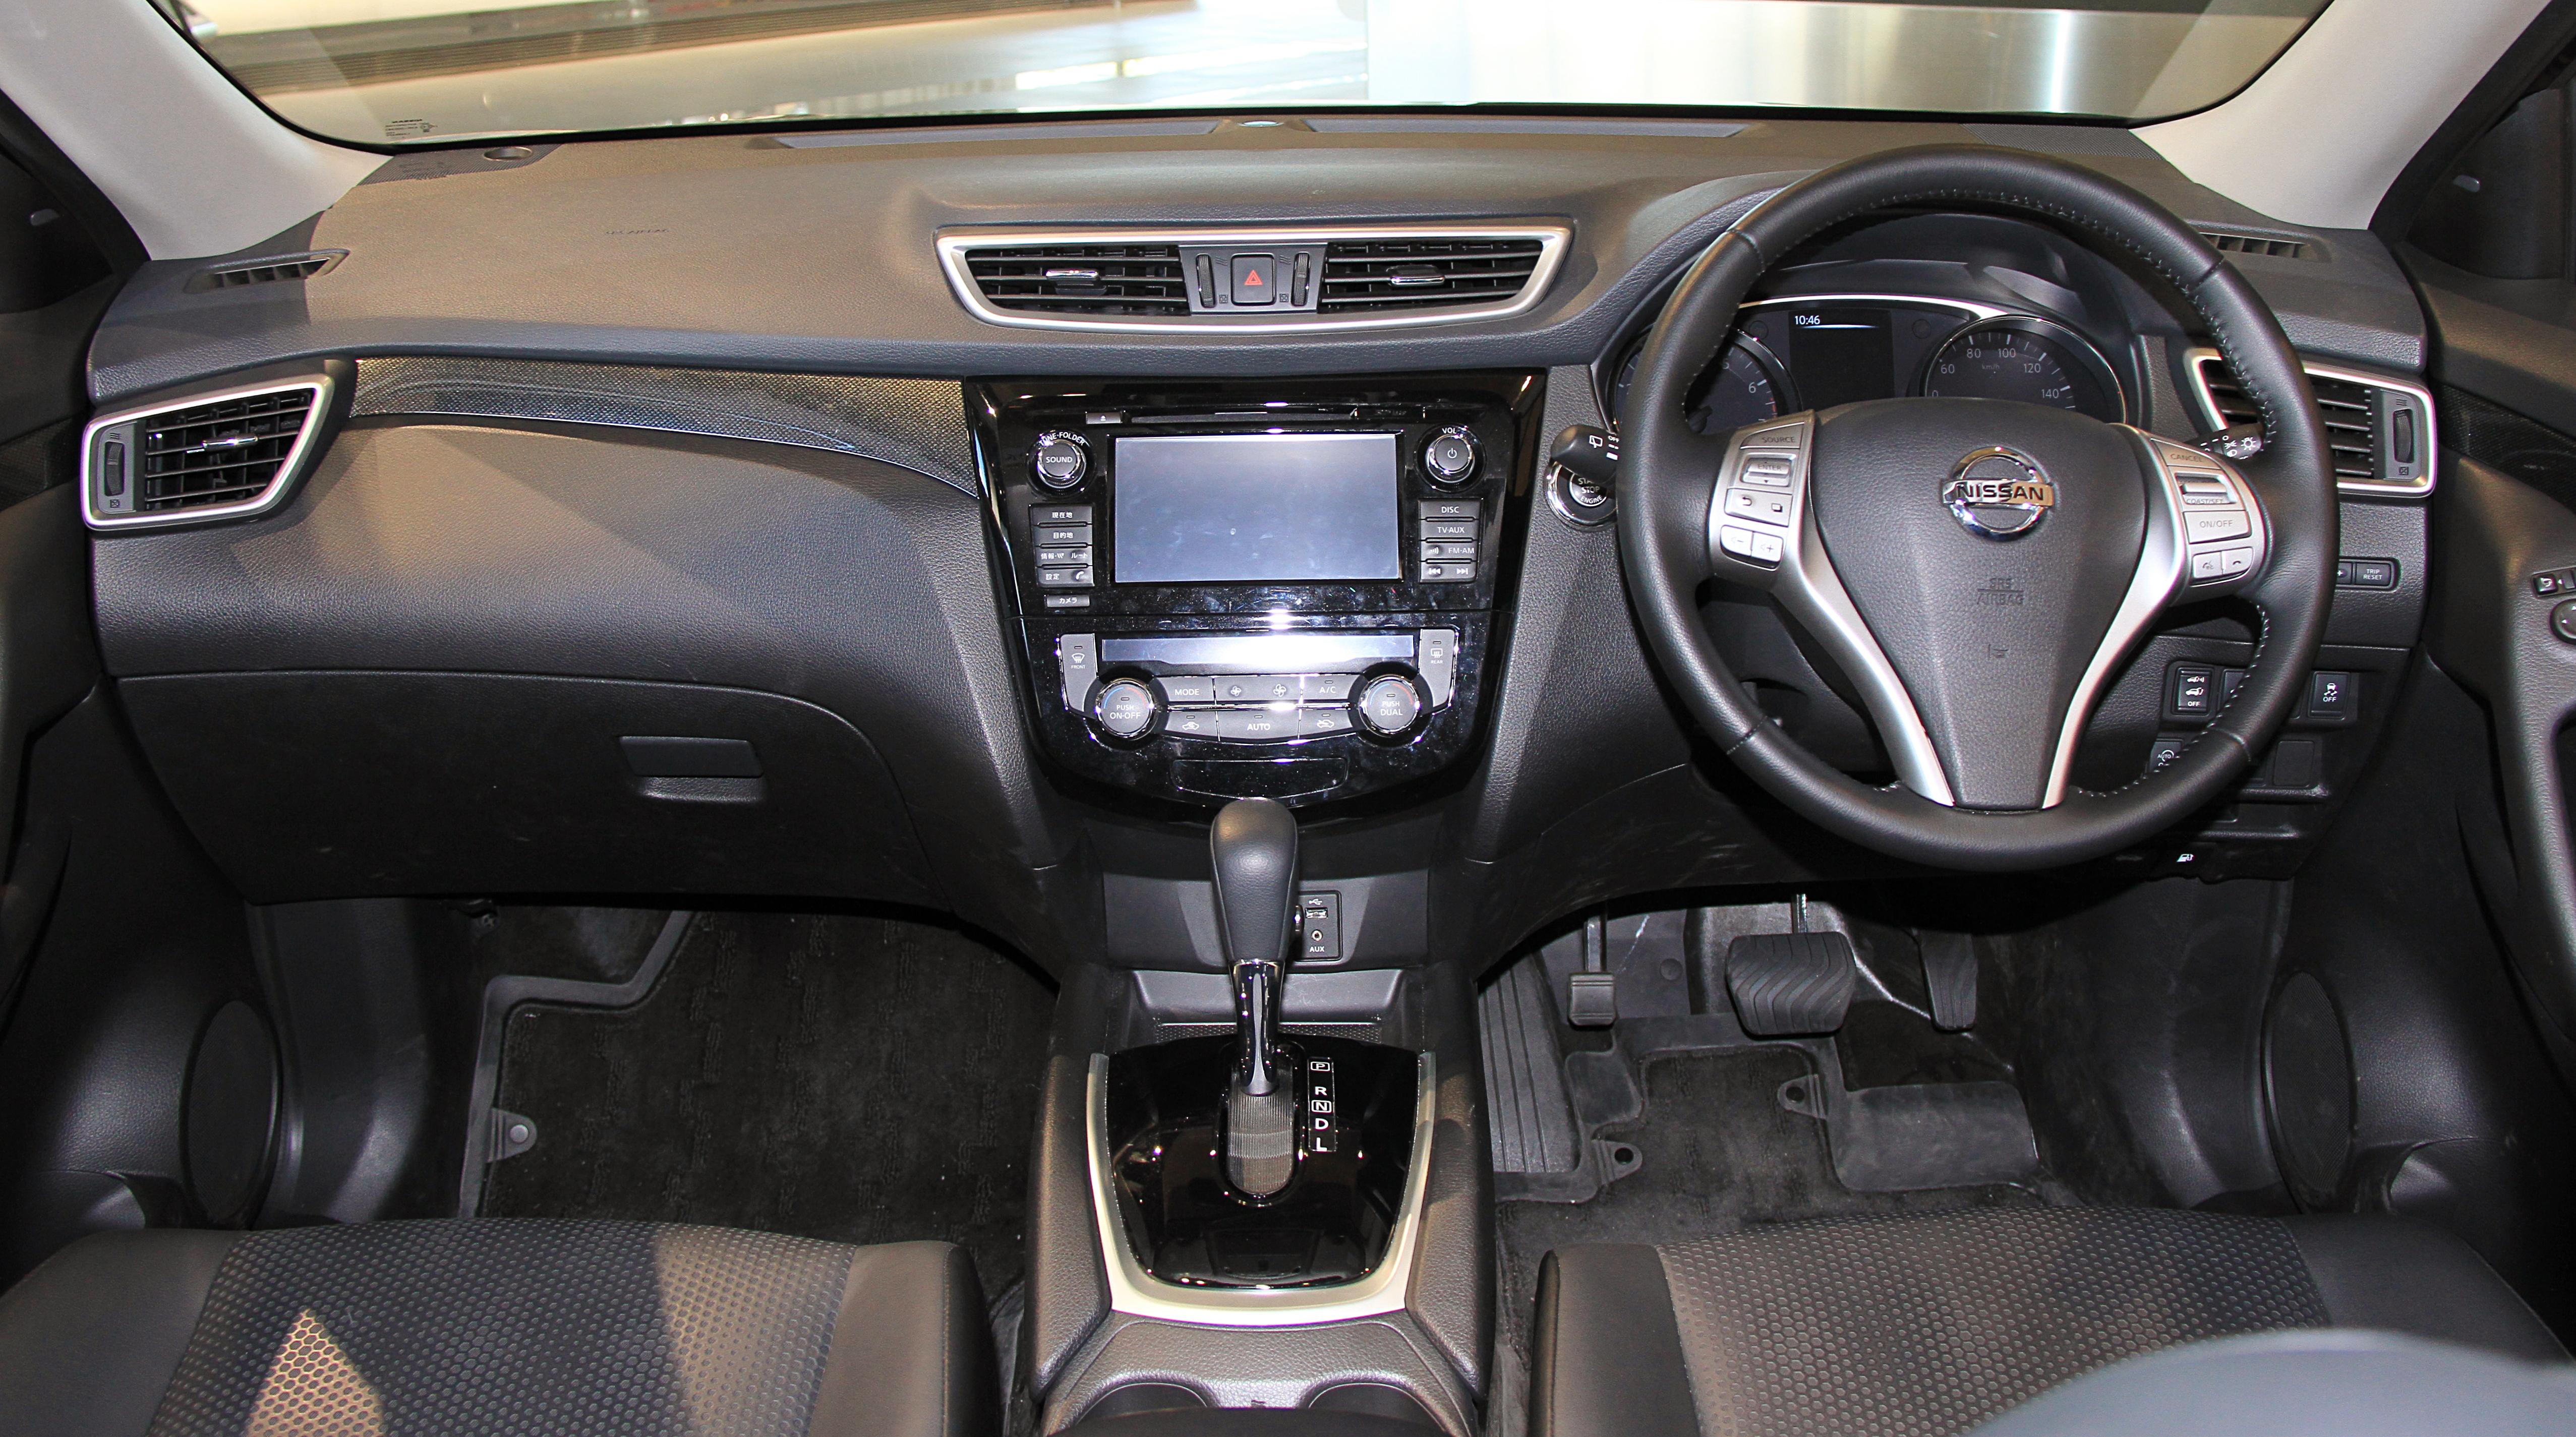 File:Nissan X-Trail 20X X-Tremer X Emergency Brake Package interior